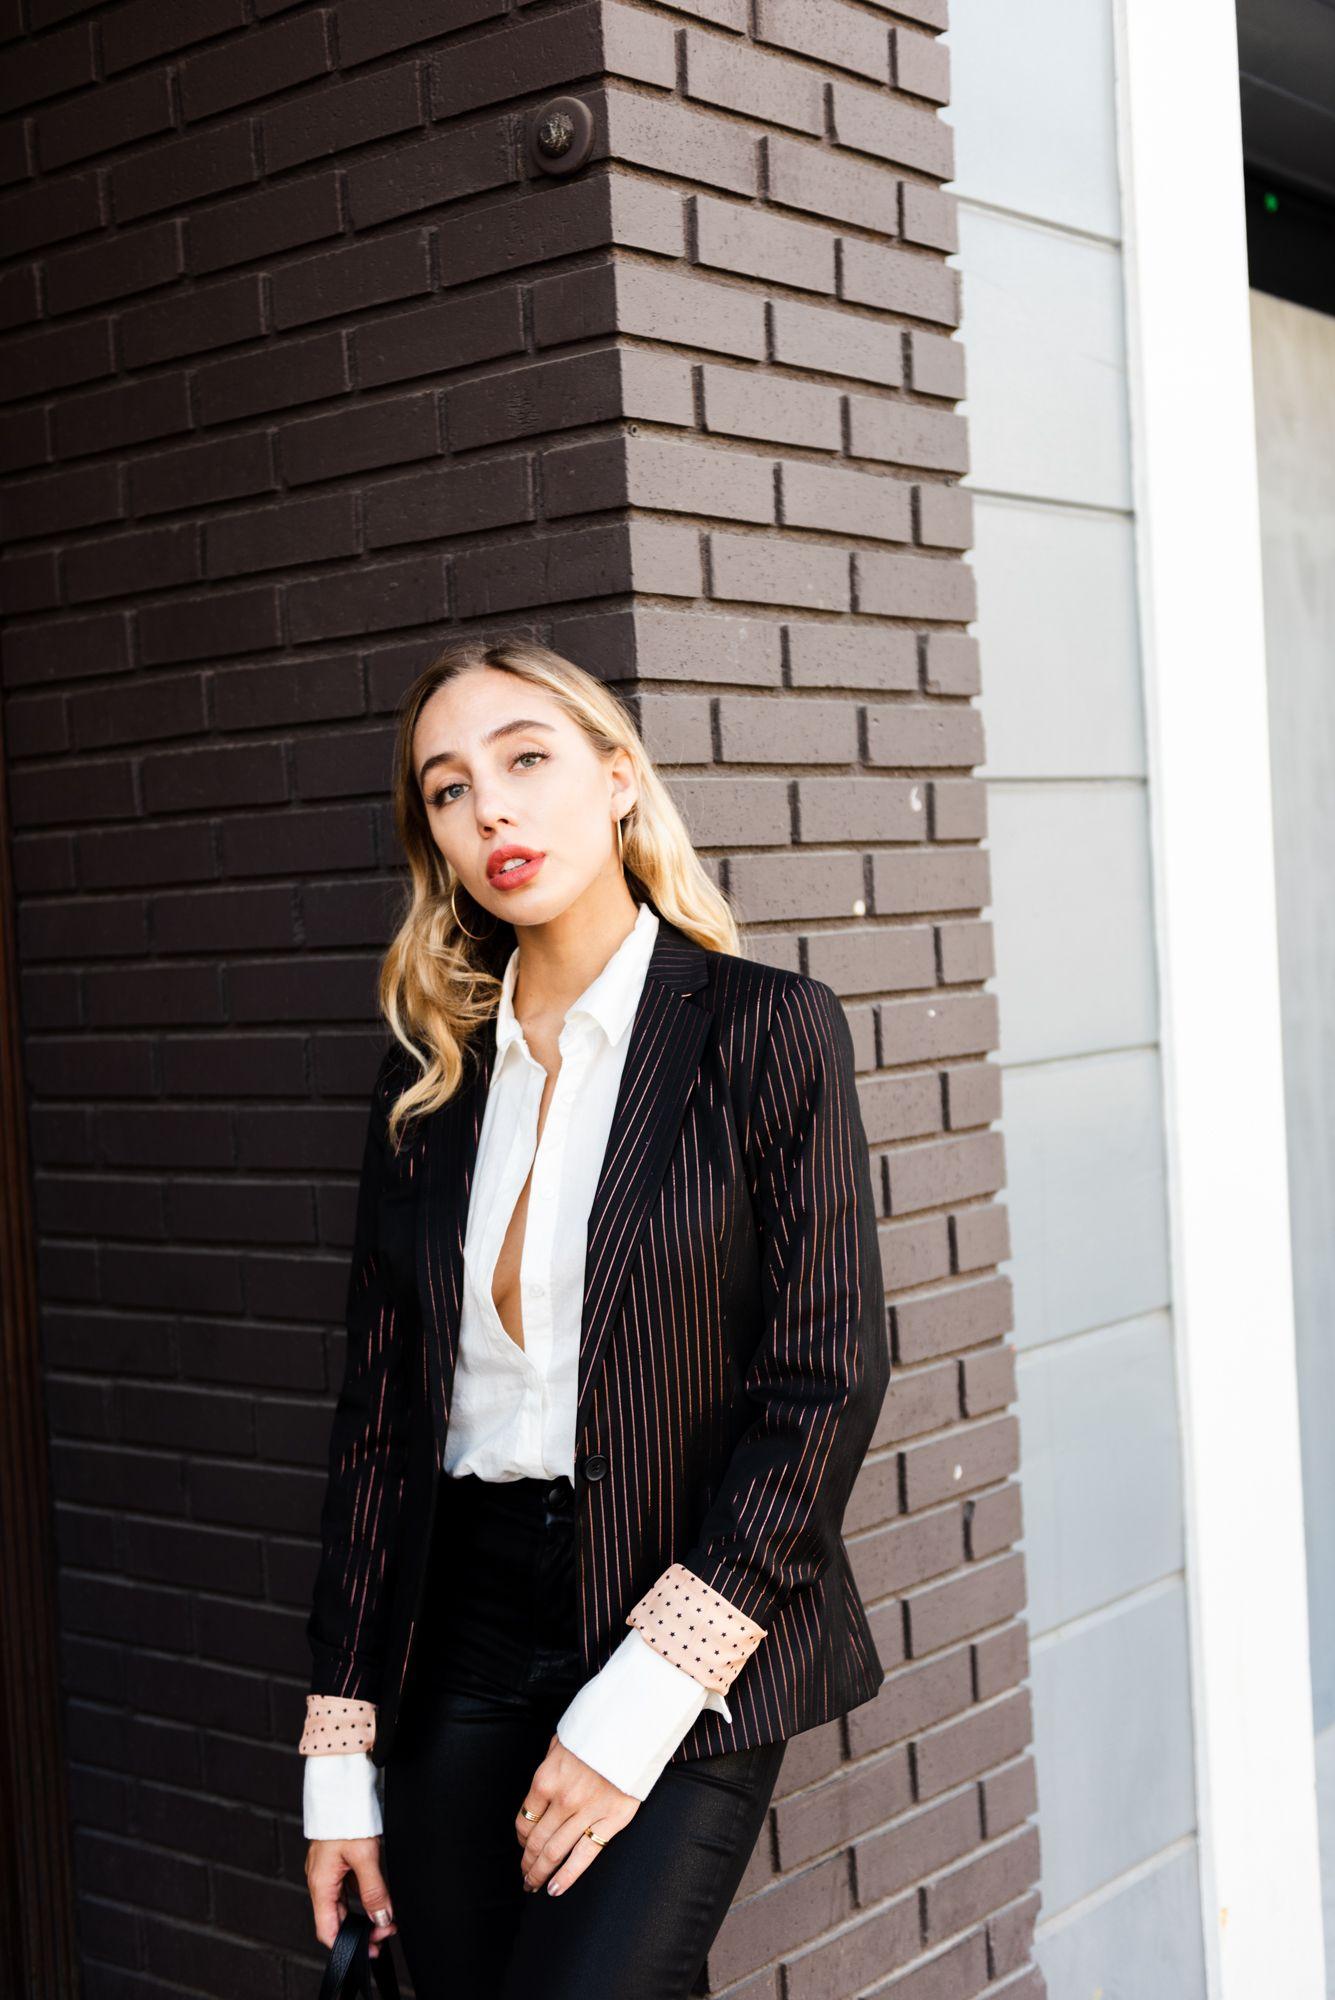 a86464056b41 Outerwear Outfits Classic Blazer Tailored Blazer Scotch and Soda Blazer  White Button Down Shirt PAIGE CLEMENCE